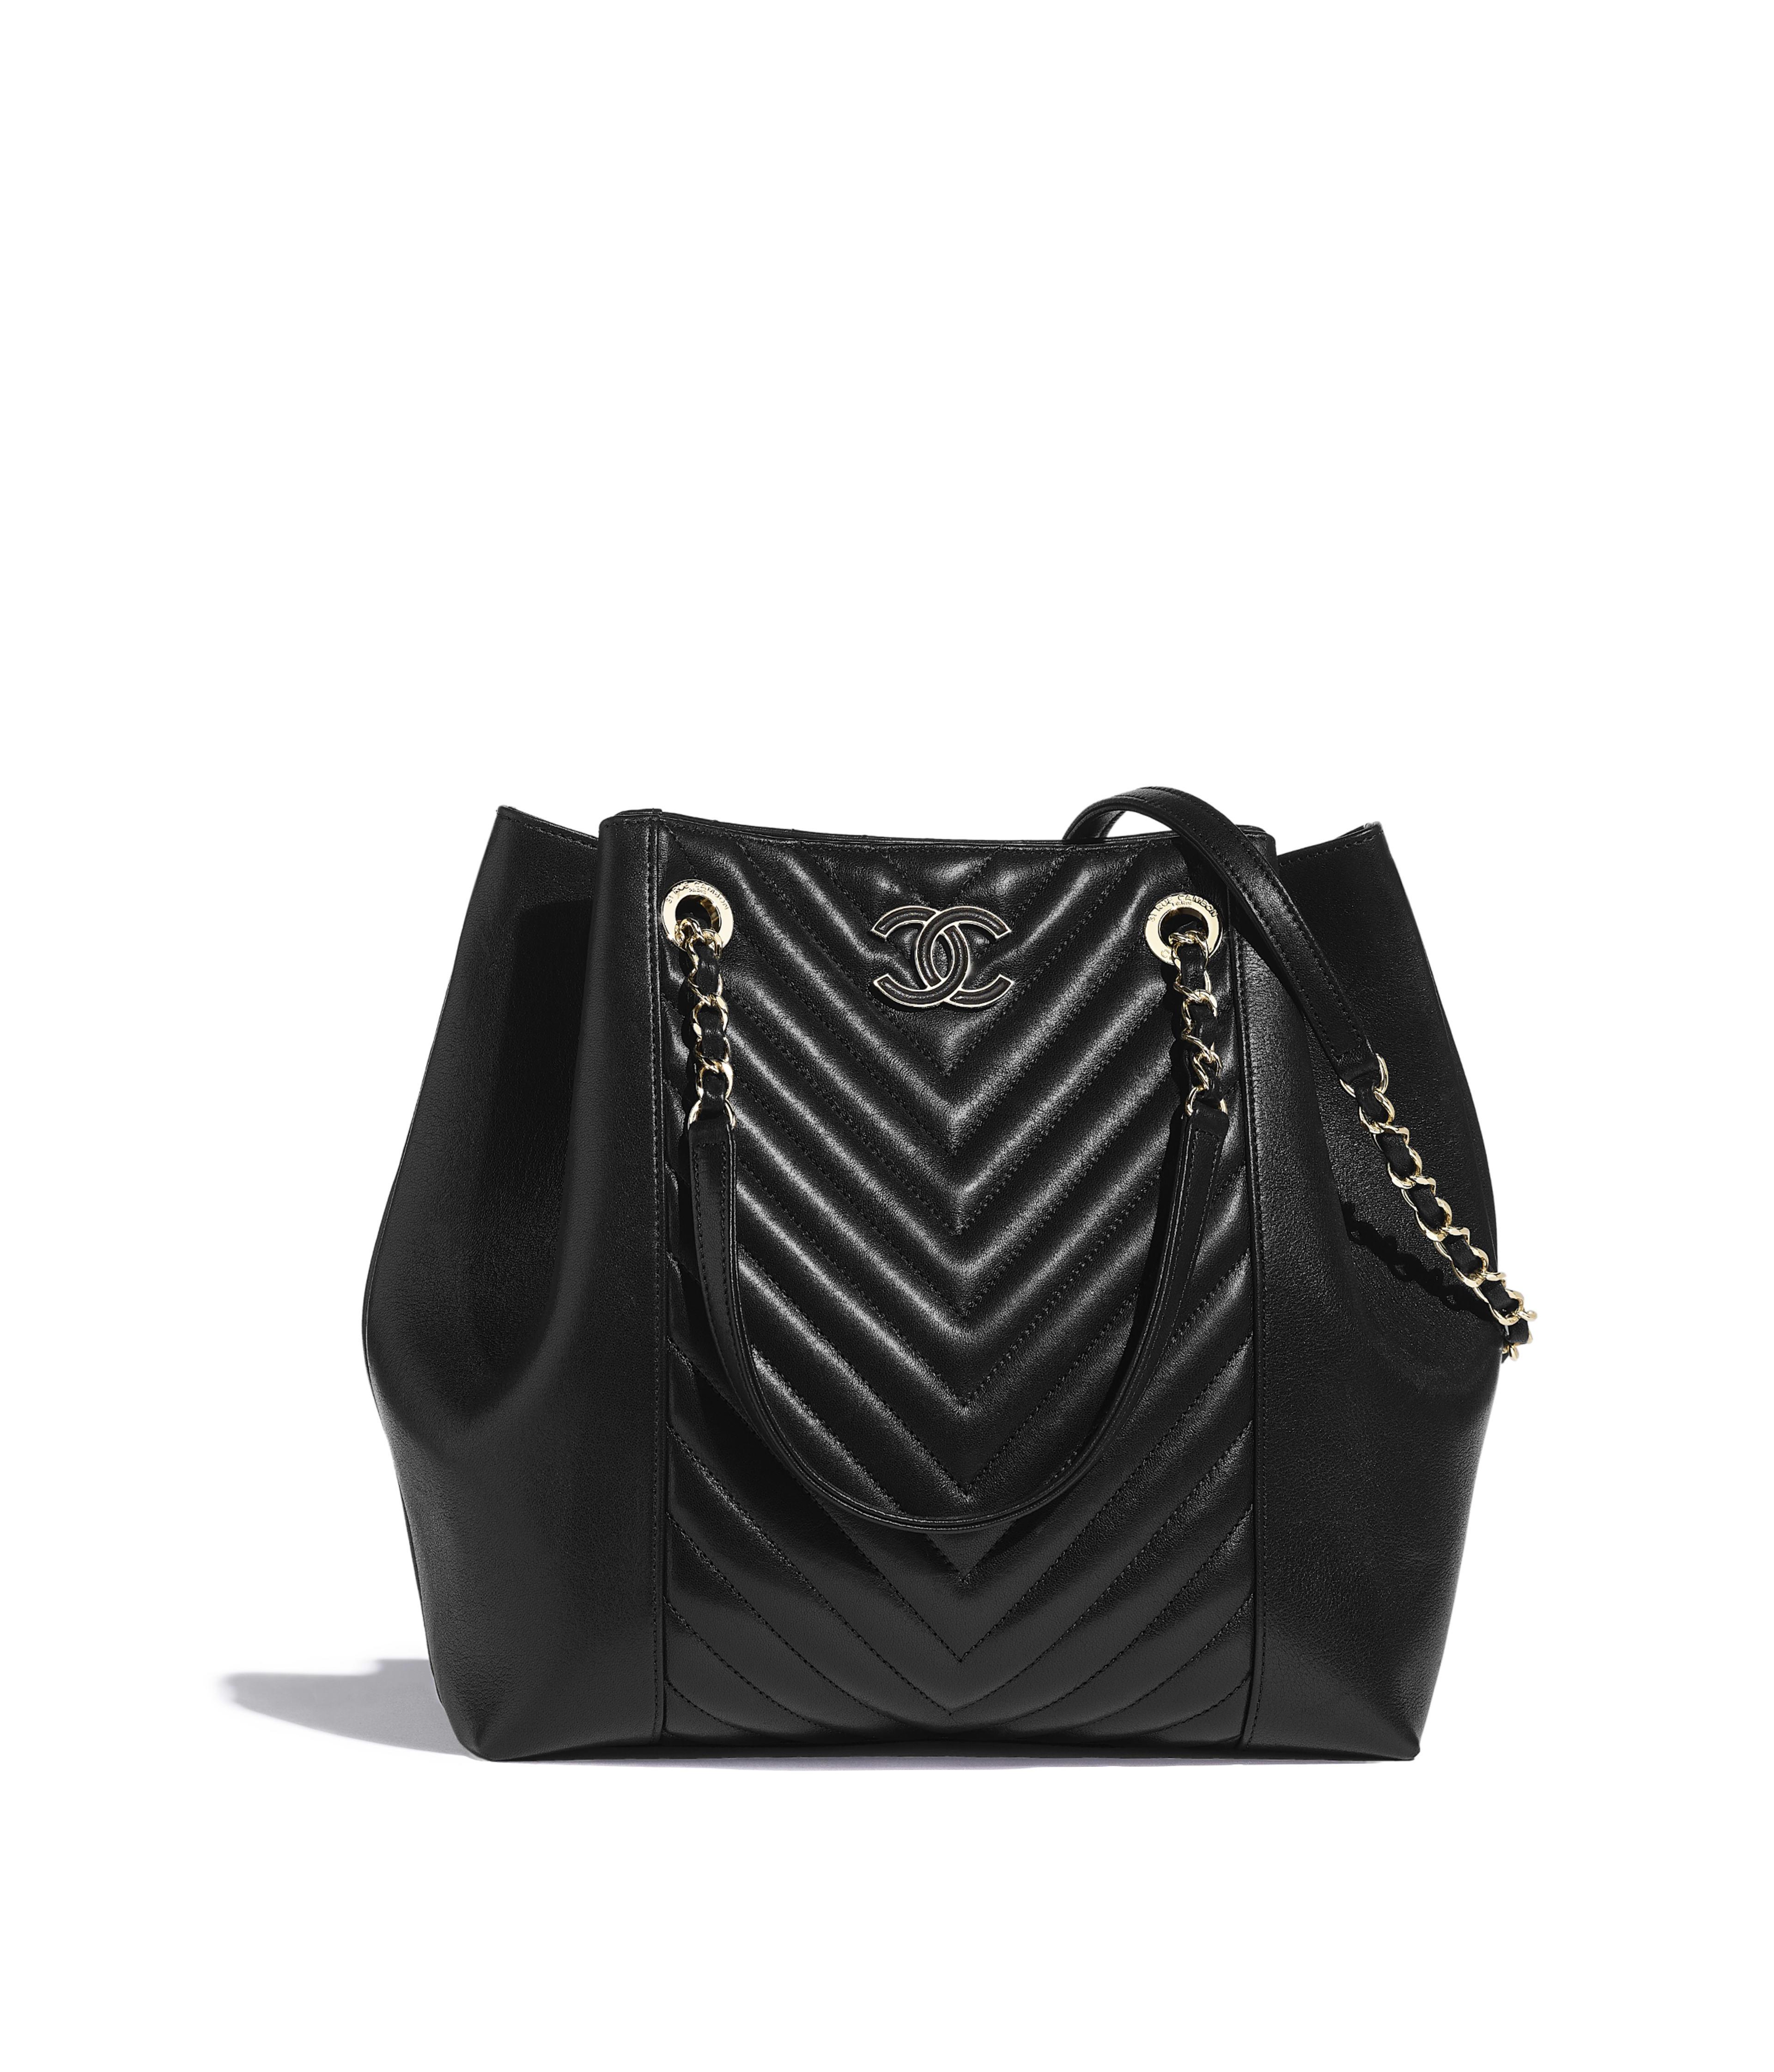 2c400cfae137 Chanel Handbags Online Shopping - Foto Handbag All Collections ...